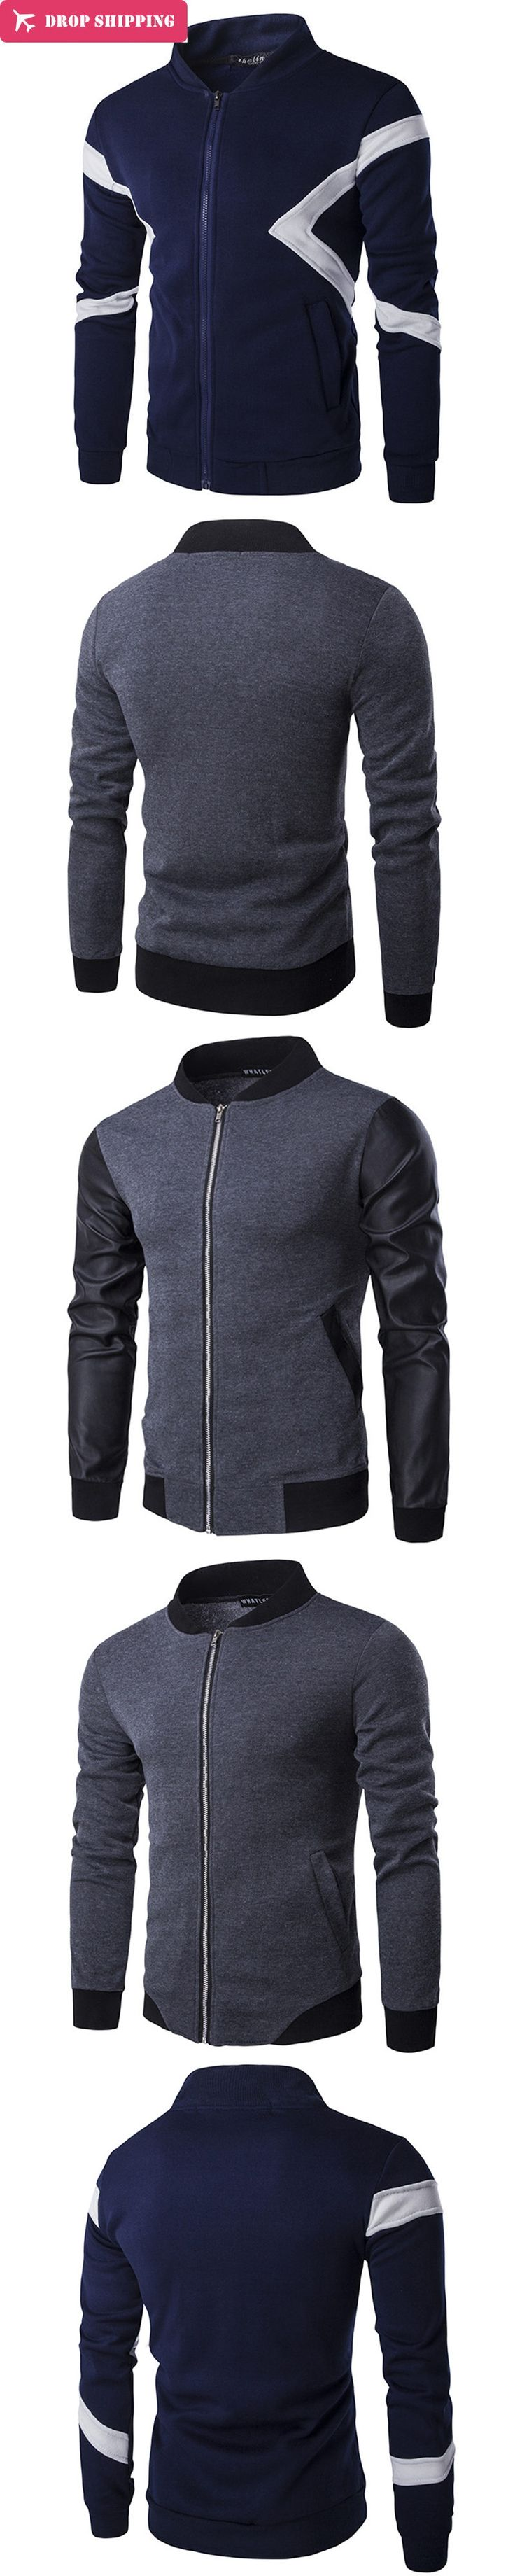 Mensautumn new Bomber Jacket male Cardigan men Winter coat Personalized tops zipper Warm cotton top coat cloak Slim Hoodies,X131